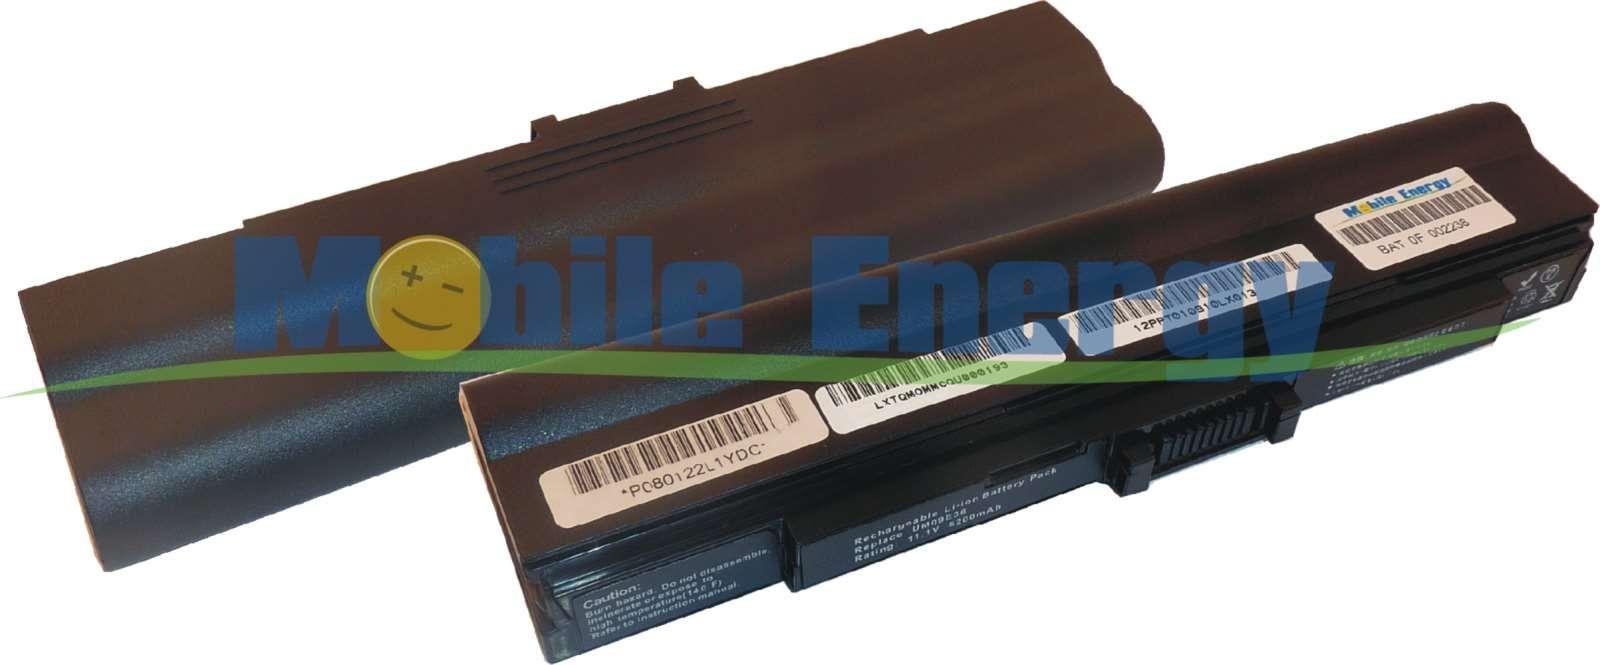 Mobile-Energy Baterie ACER Aspire 1410 / Aspire 1810T / Timeline